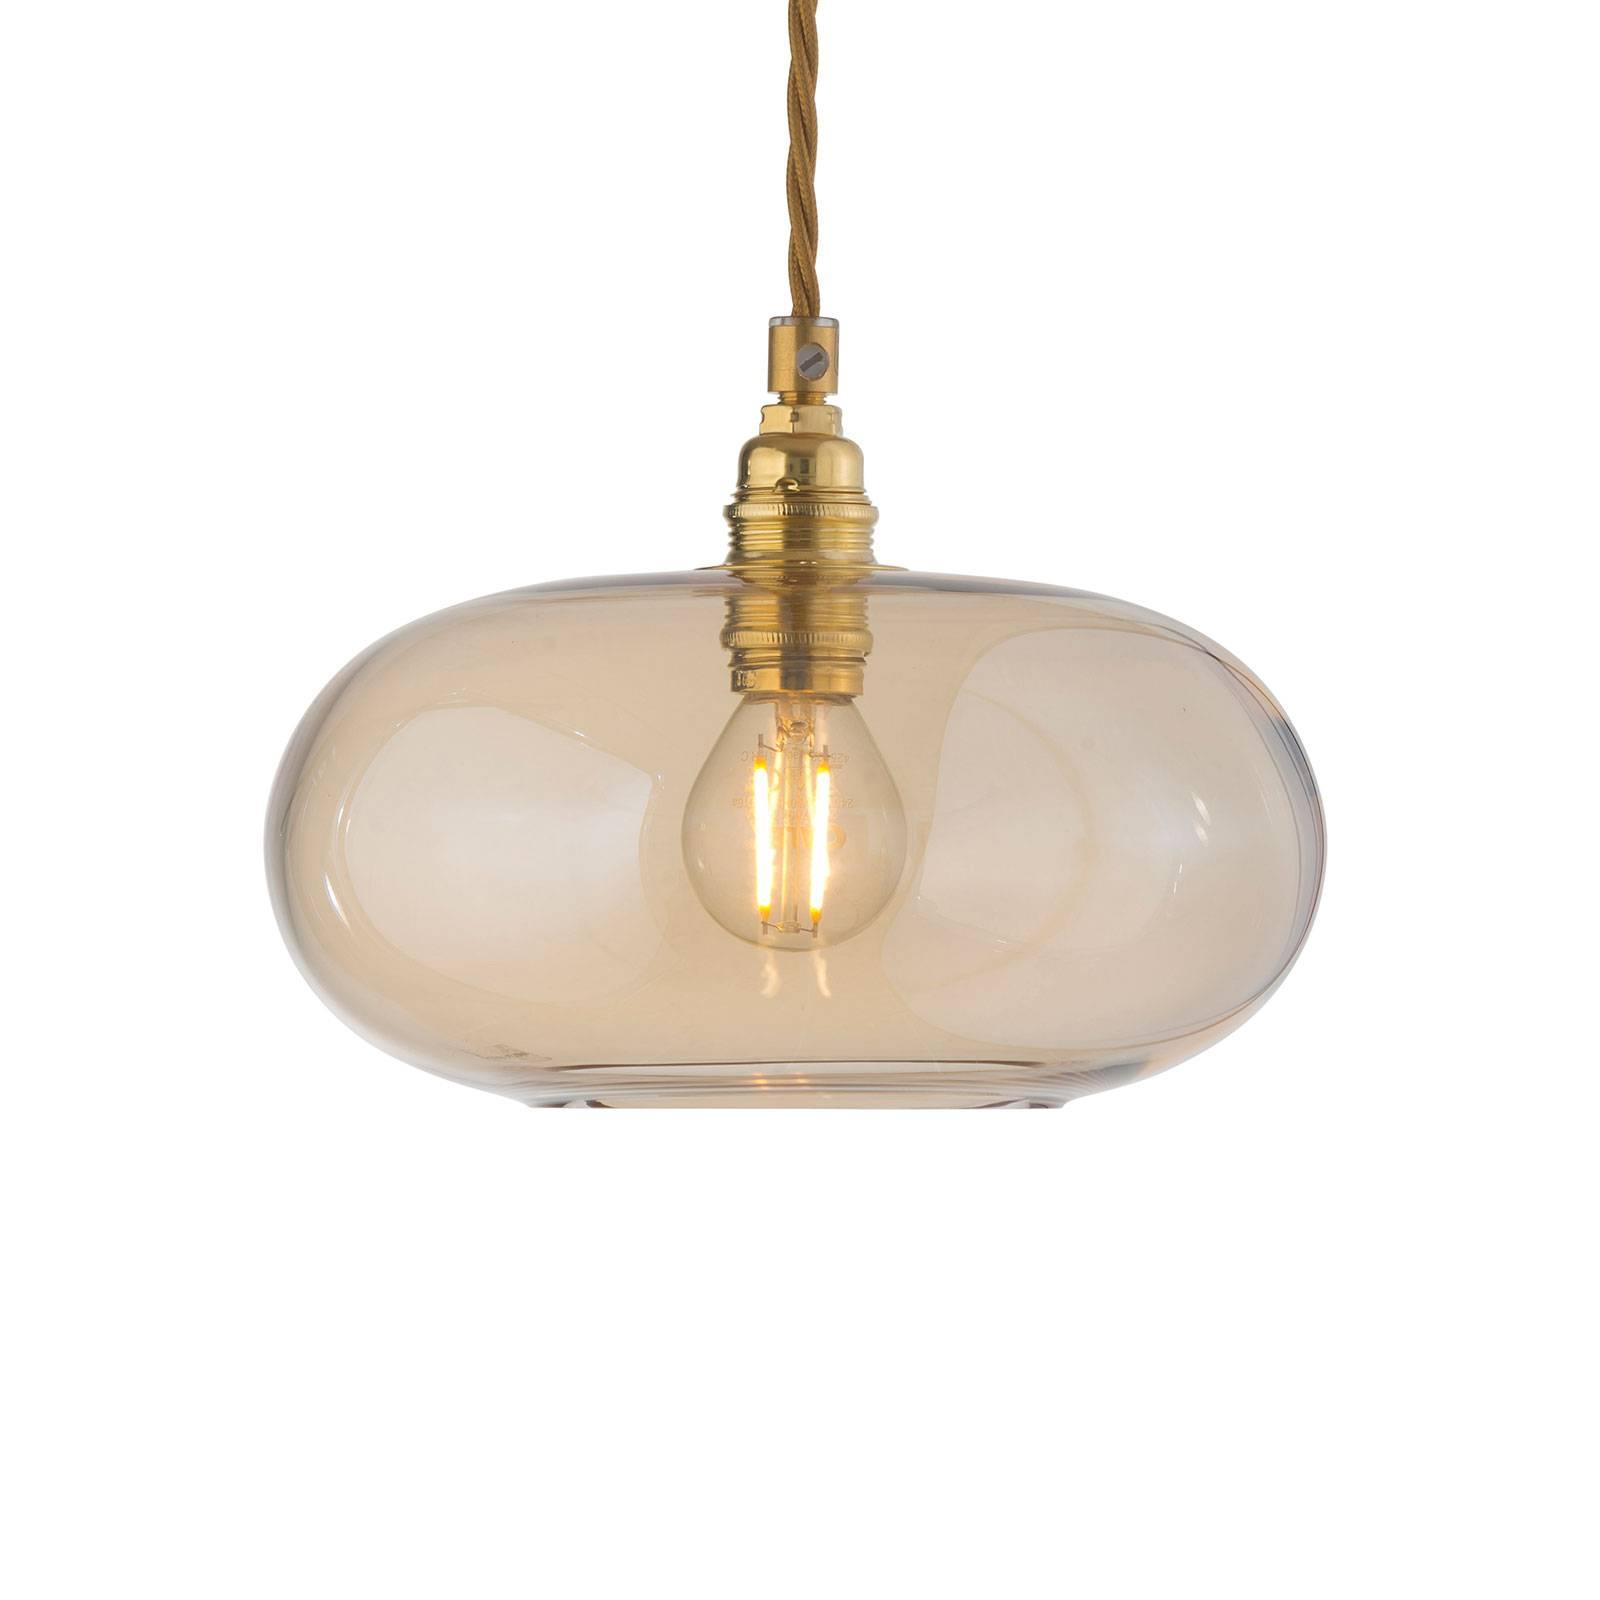 EBB & FLOW Horizon hanglamp goud rook Ø 21cm